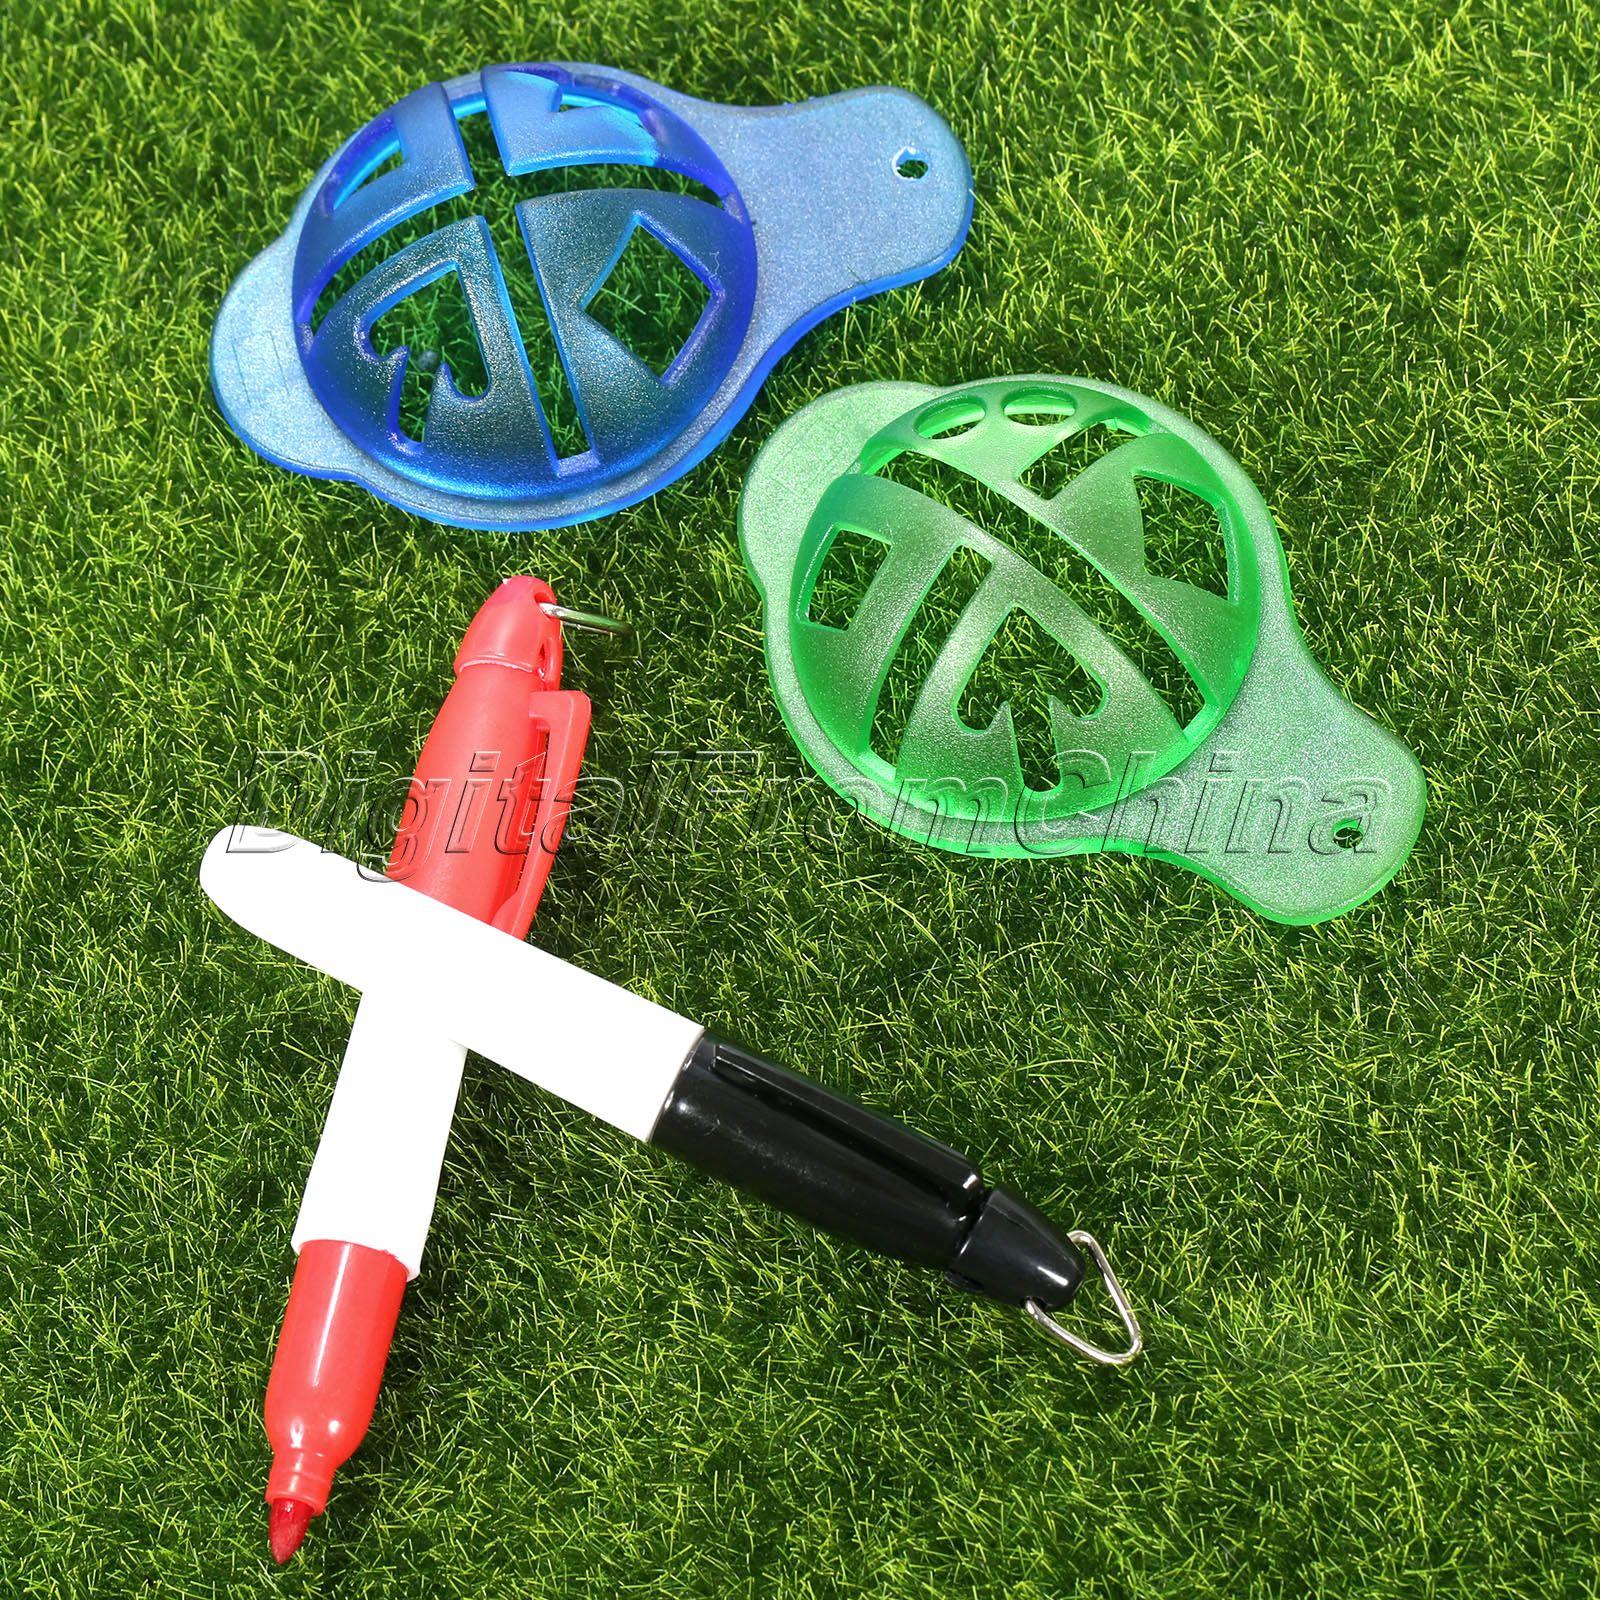 gohantee Golf Ball Liner Marcator Pen Ball Strokes Golf Formare SIDA - Golf - Fotografie 6